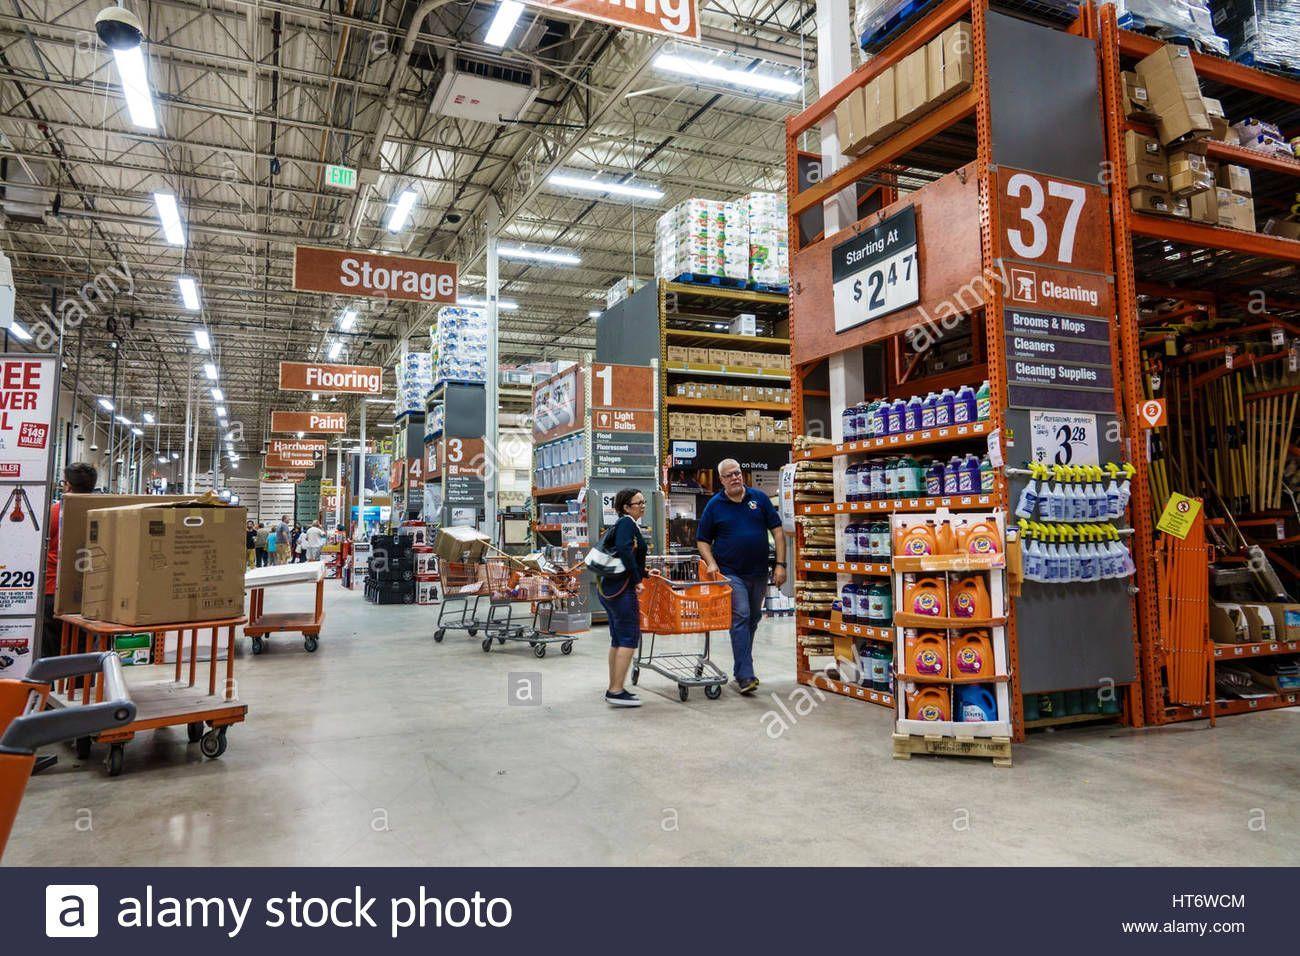 Superior Miami Florida Home Depot Store Home Improvement Aisle Shelves Sign Sale Man  Woman Couple Interior Shopping Cart Stock Photo # ...